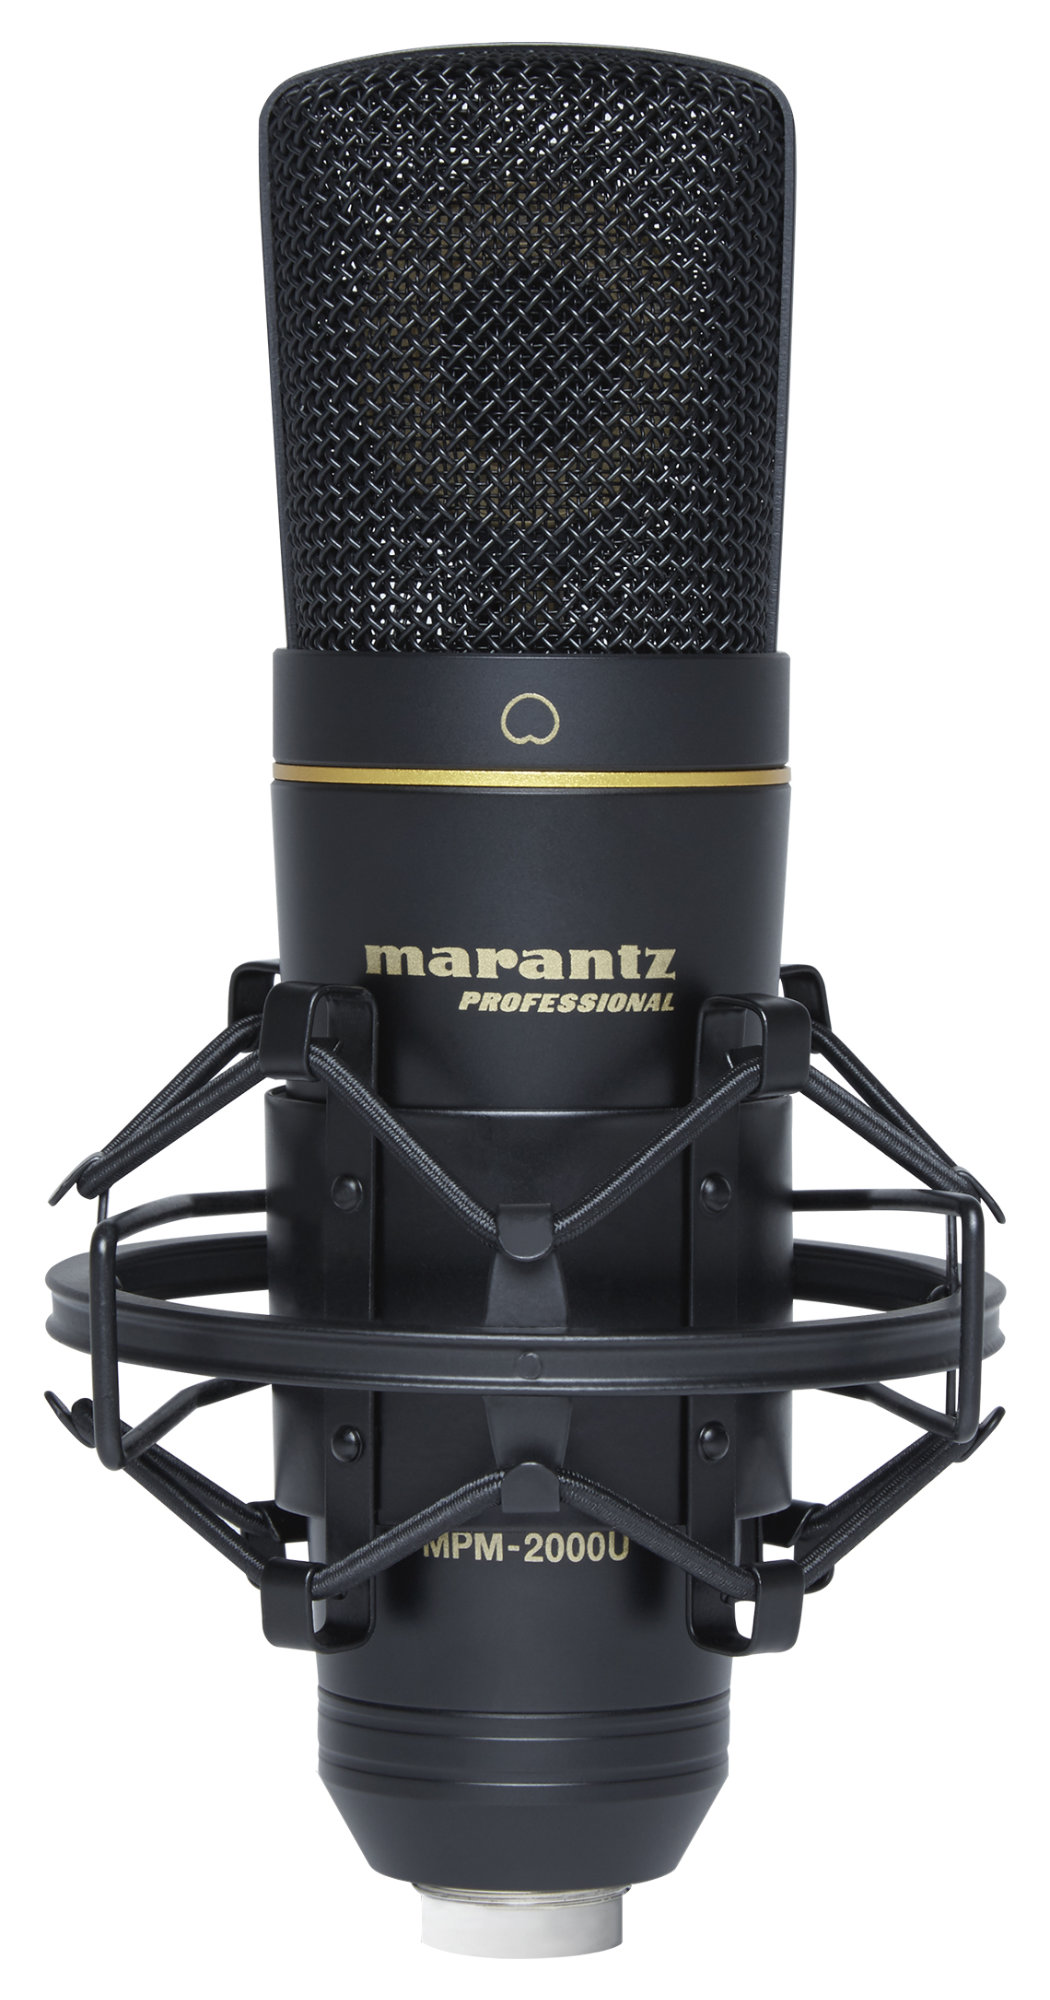 Mikrofone - Marantz MPM 2000U Retoure (Zustand sehr gut) - Onlineshop Musikhaus Kirstein